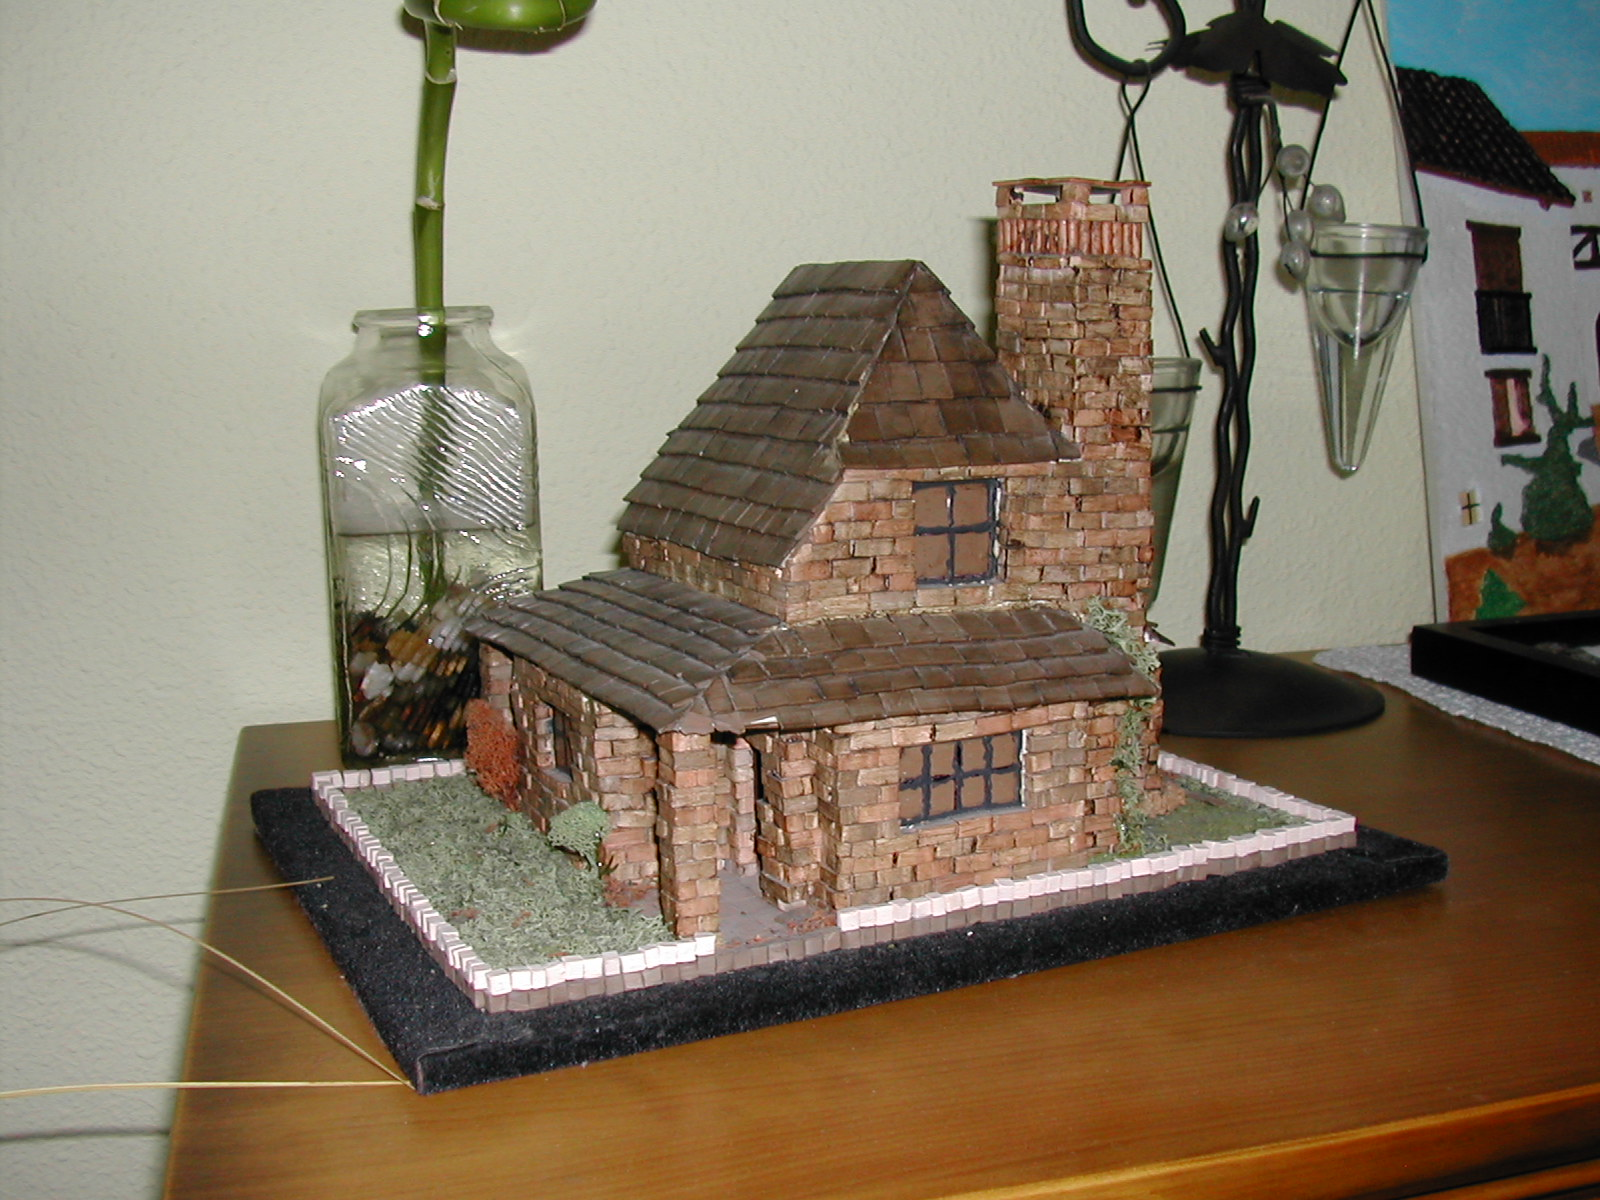 UN POCO PARA COMPARTIR: Casa de ladrillo con chimenea